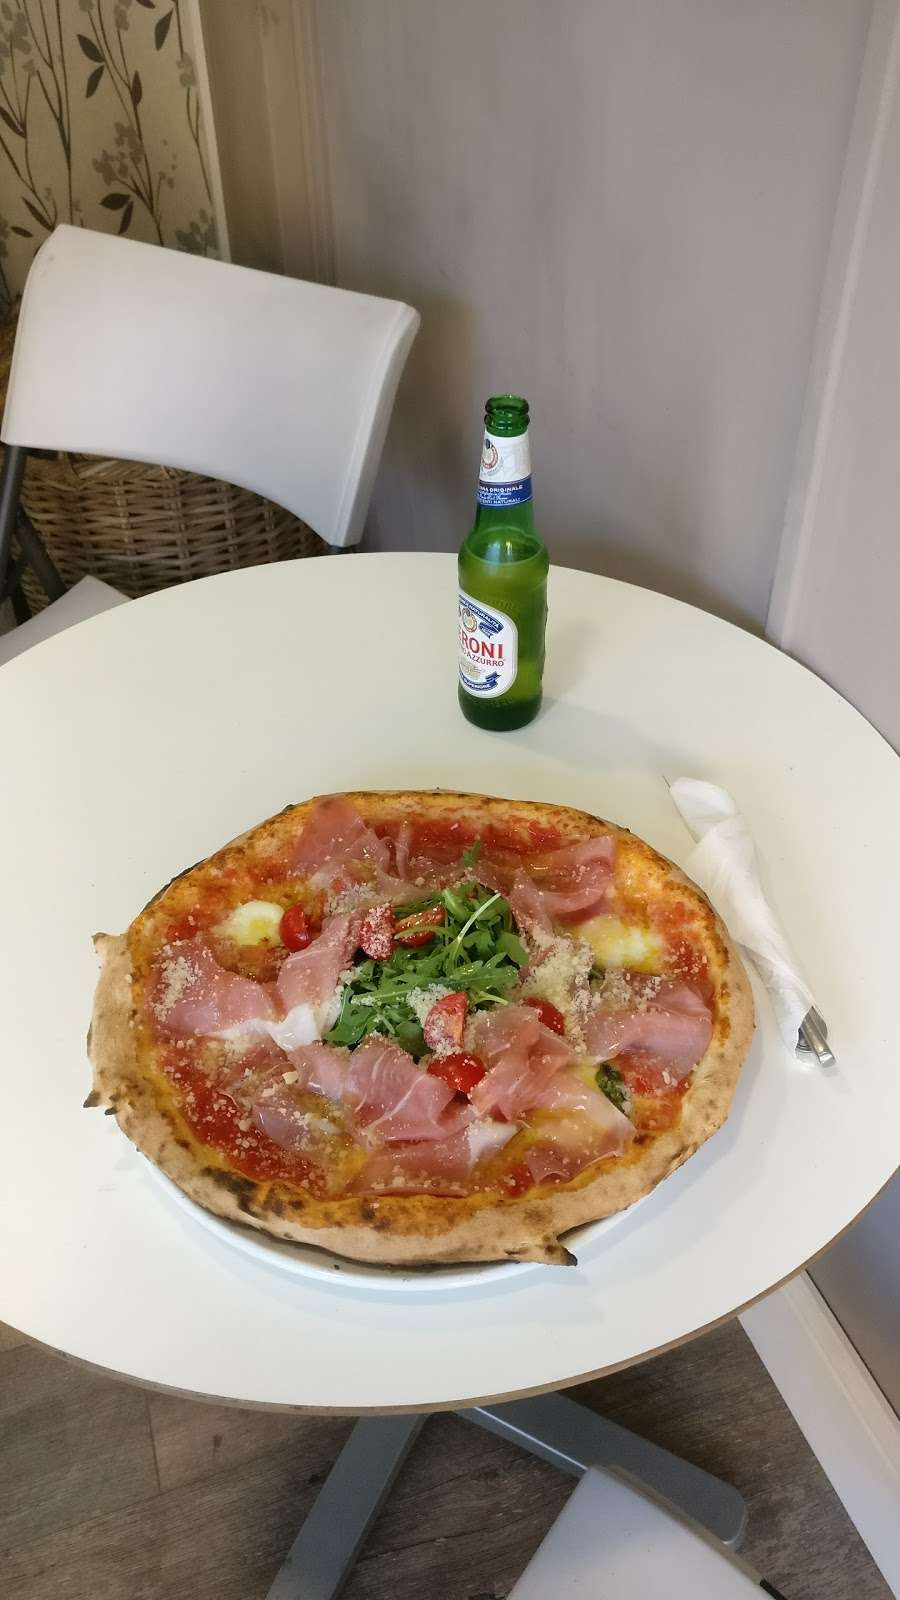 Da Moreno Pizzeria - meal takeaway  | Photo 9 of 10 | Address: 190 Northfield Ave, London W13 9SJ, UK | Phone: 020 8579 8905